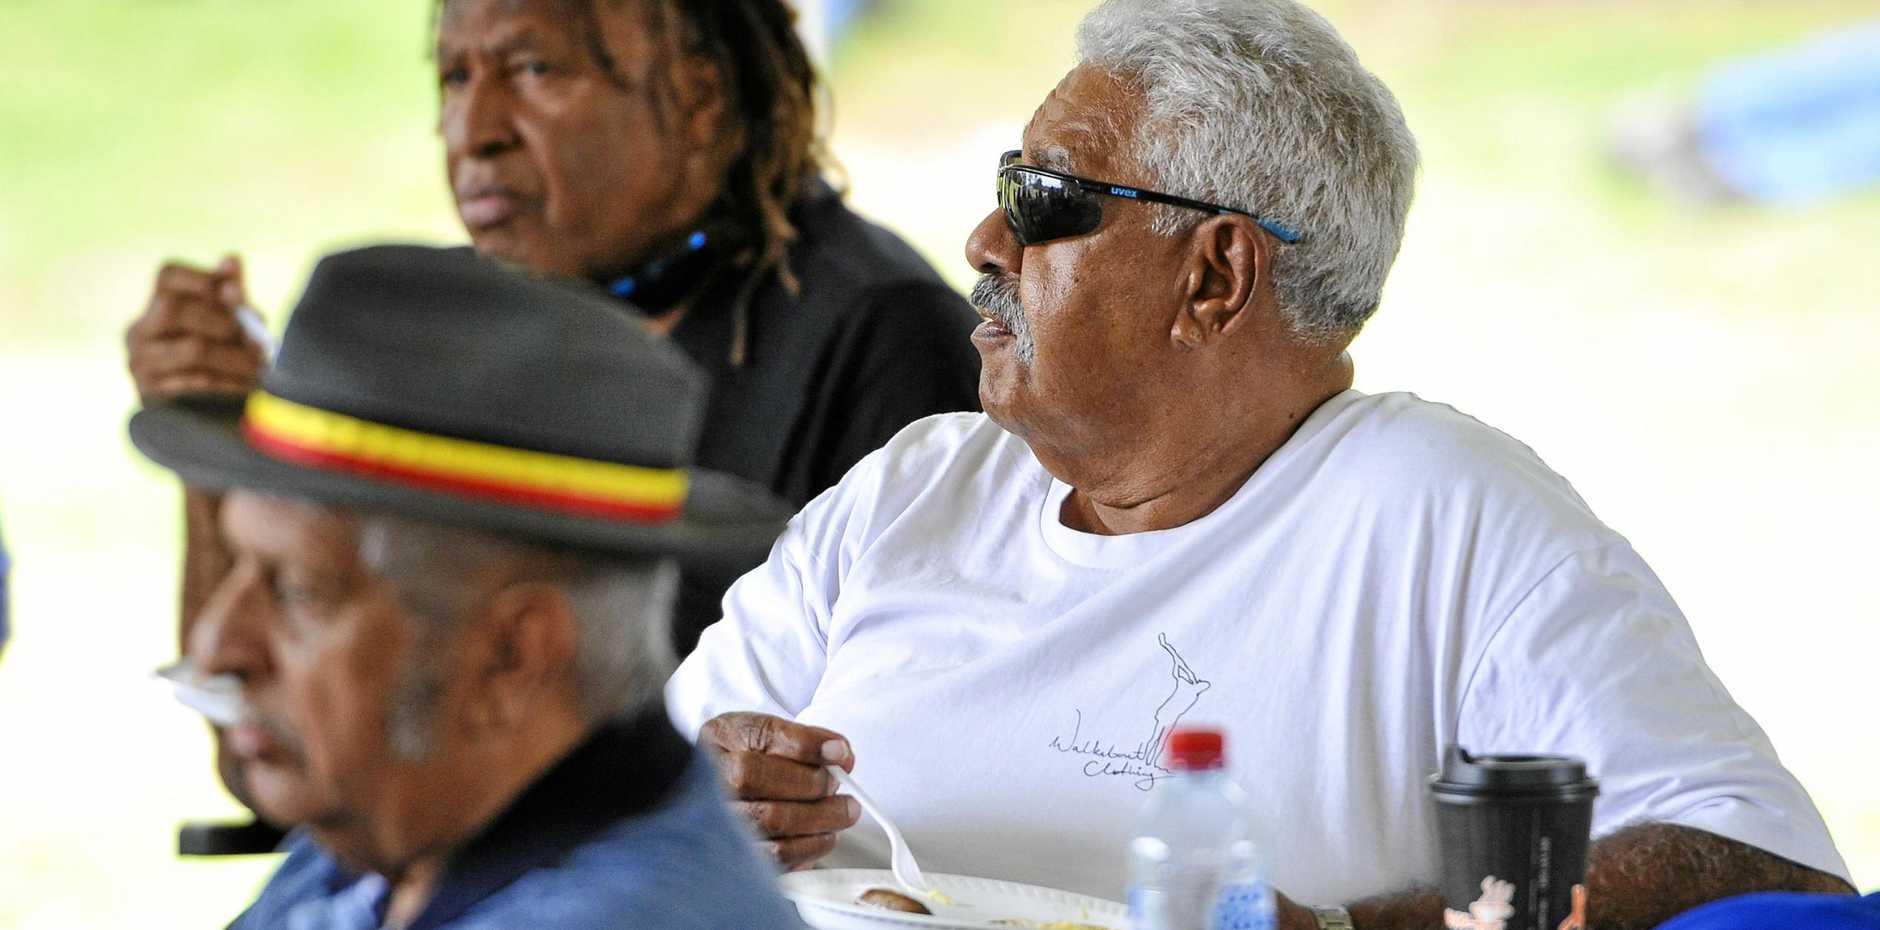 MORE TO BE DONE: Gooreng Gooreng elder Richard Johnson at the Gladstone Marina.